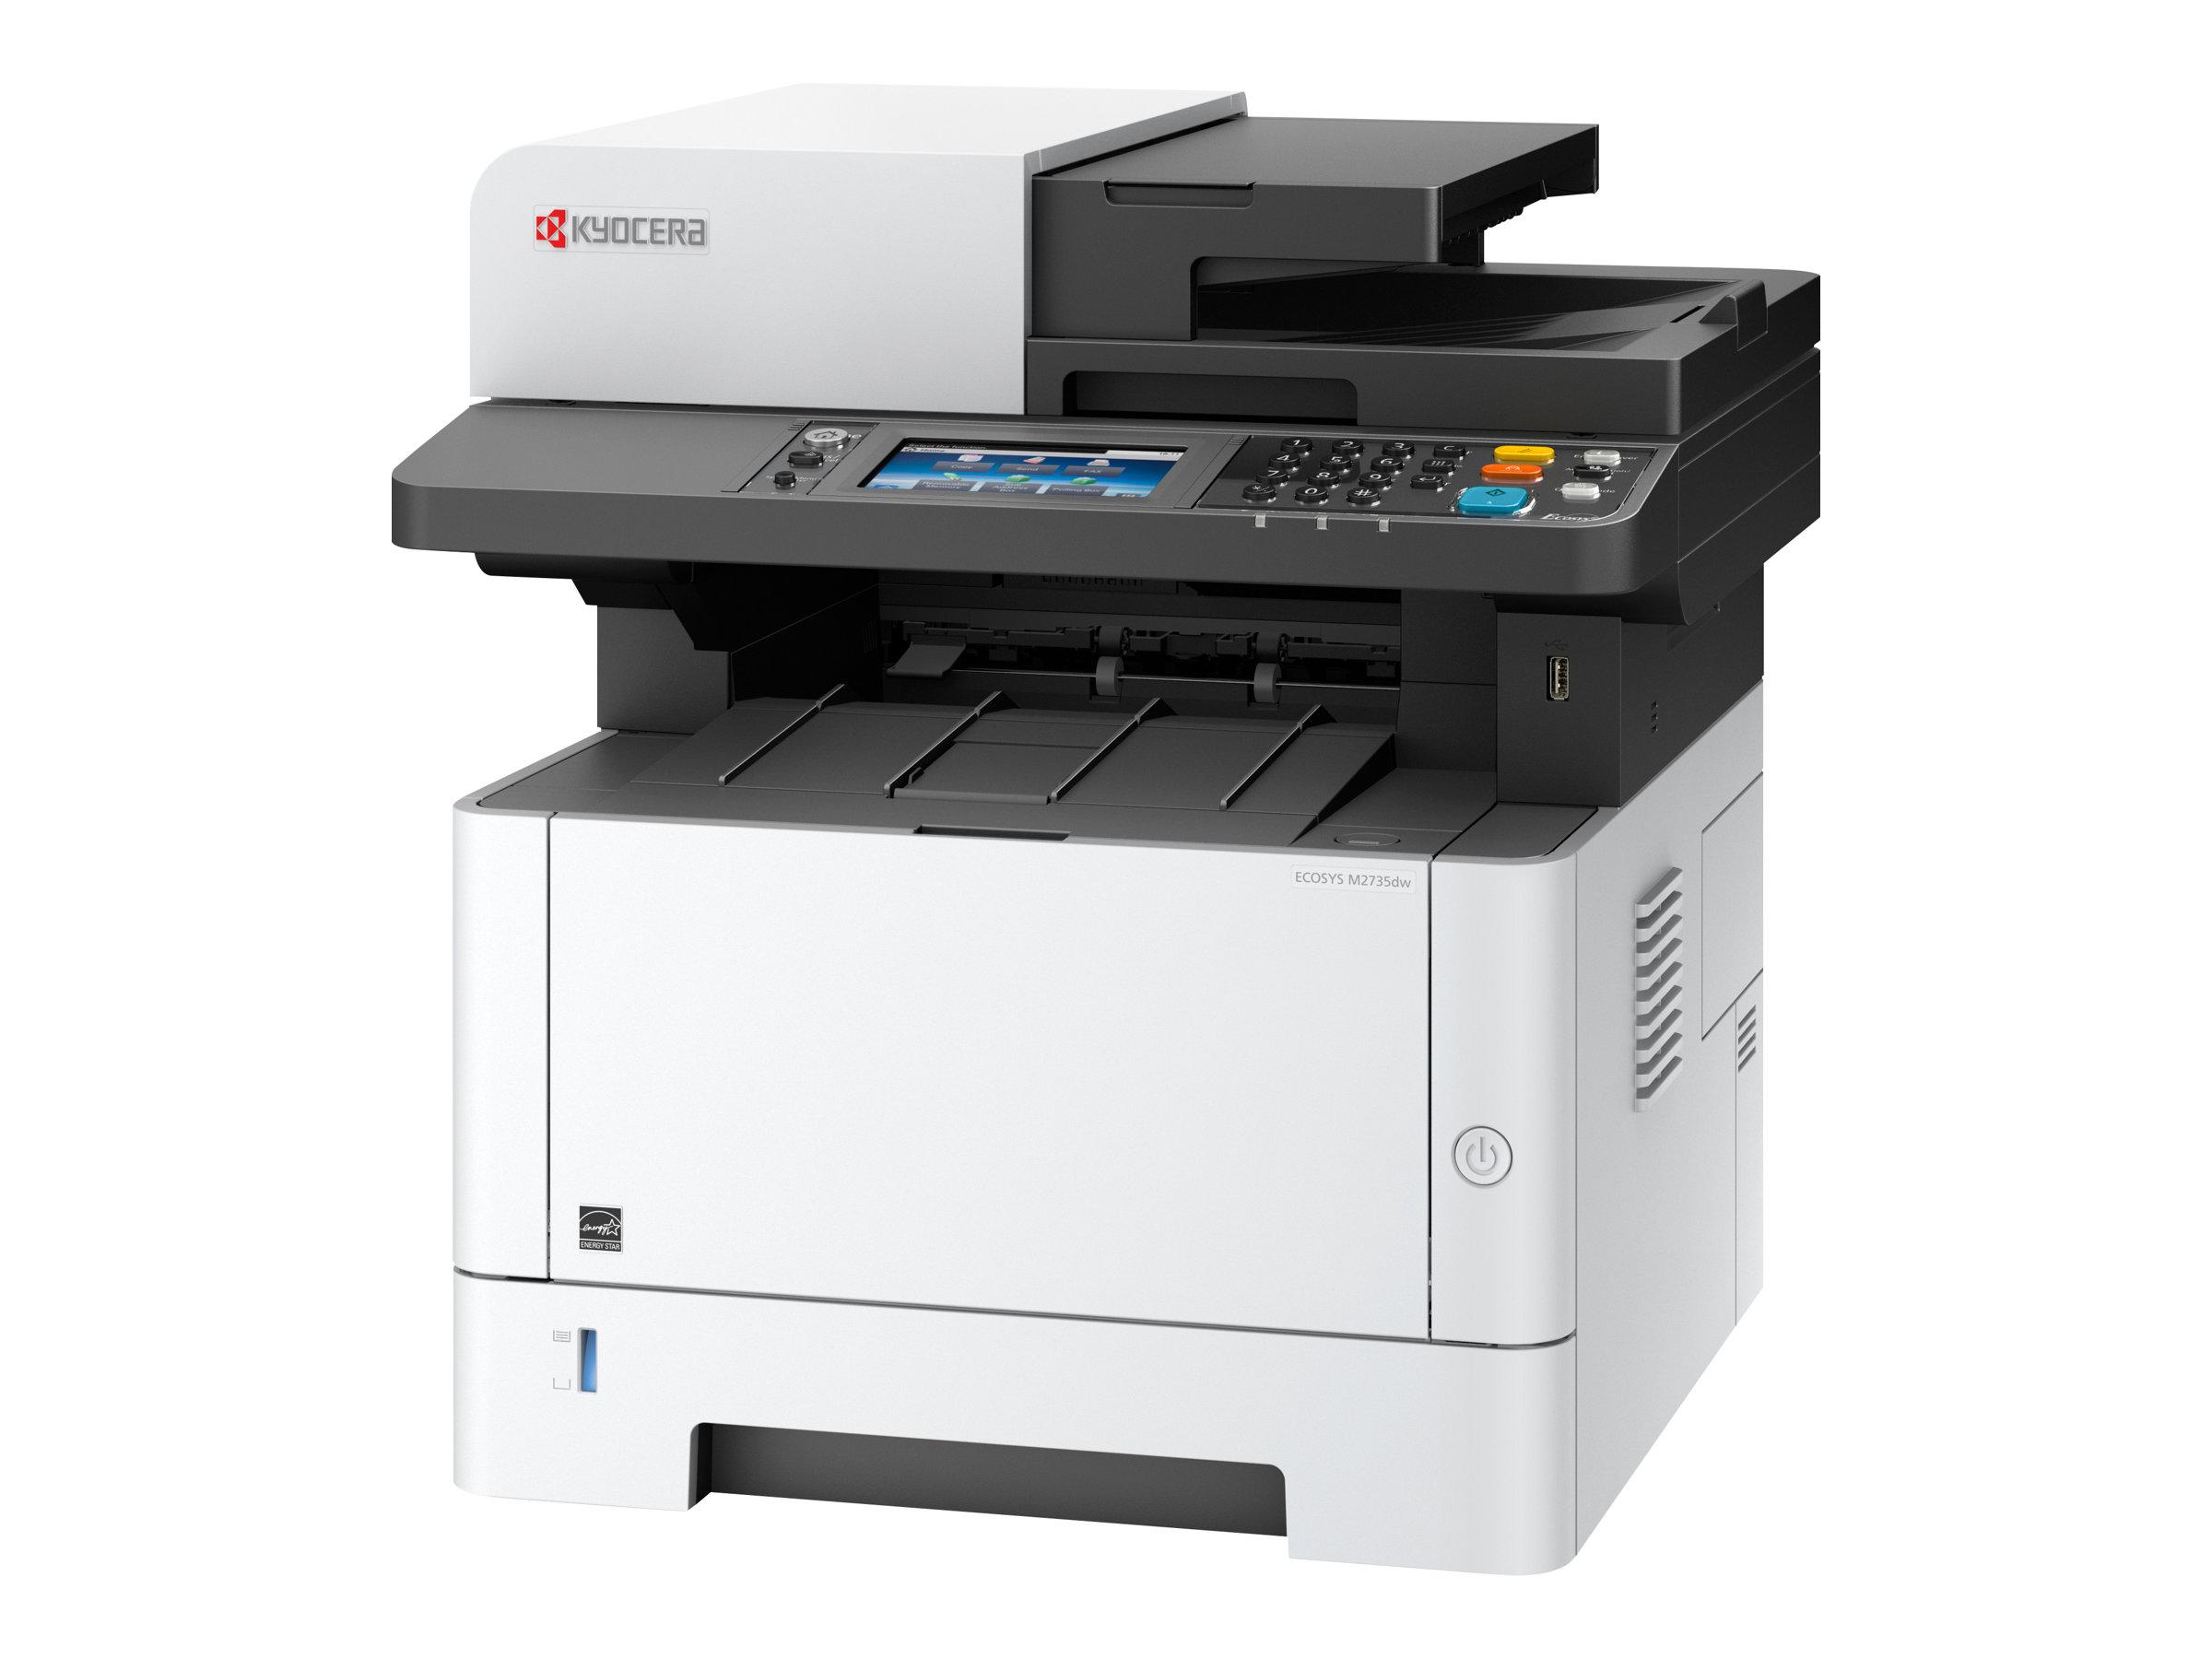 Kyocera ECOSYS M2735dw - Multifunktionsdrucker - s/w - Laser - Legal (216 x 356 mm) (Original) - A4/Legal (Medien)